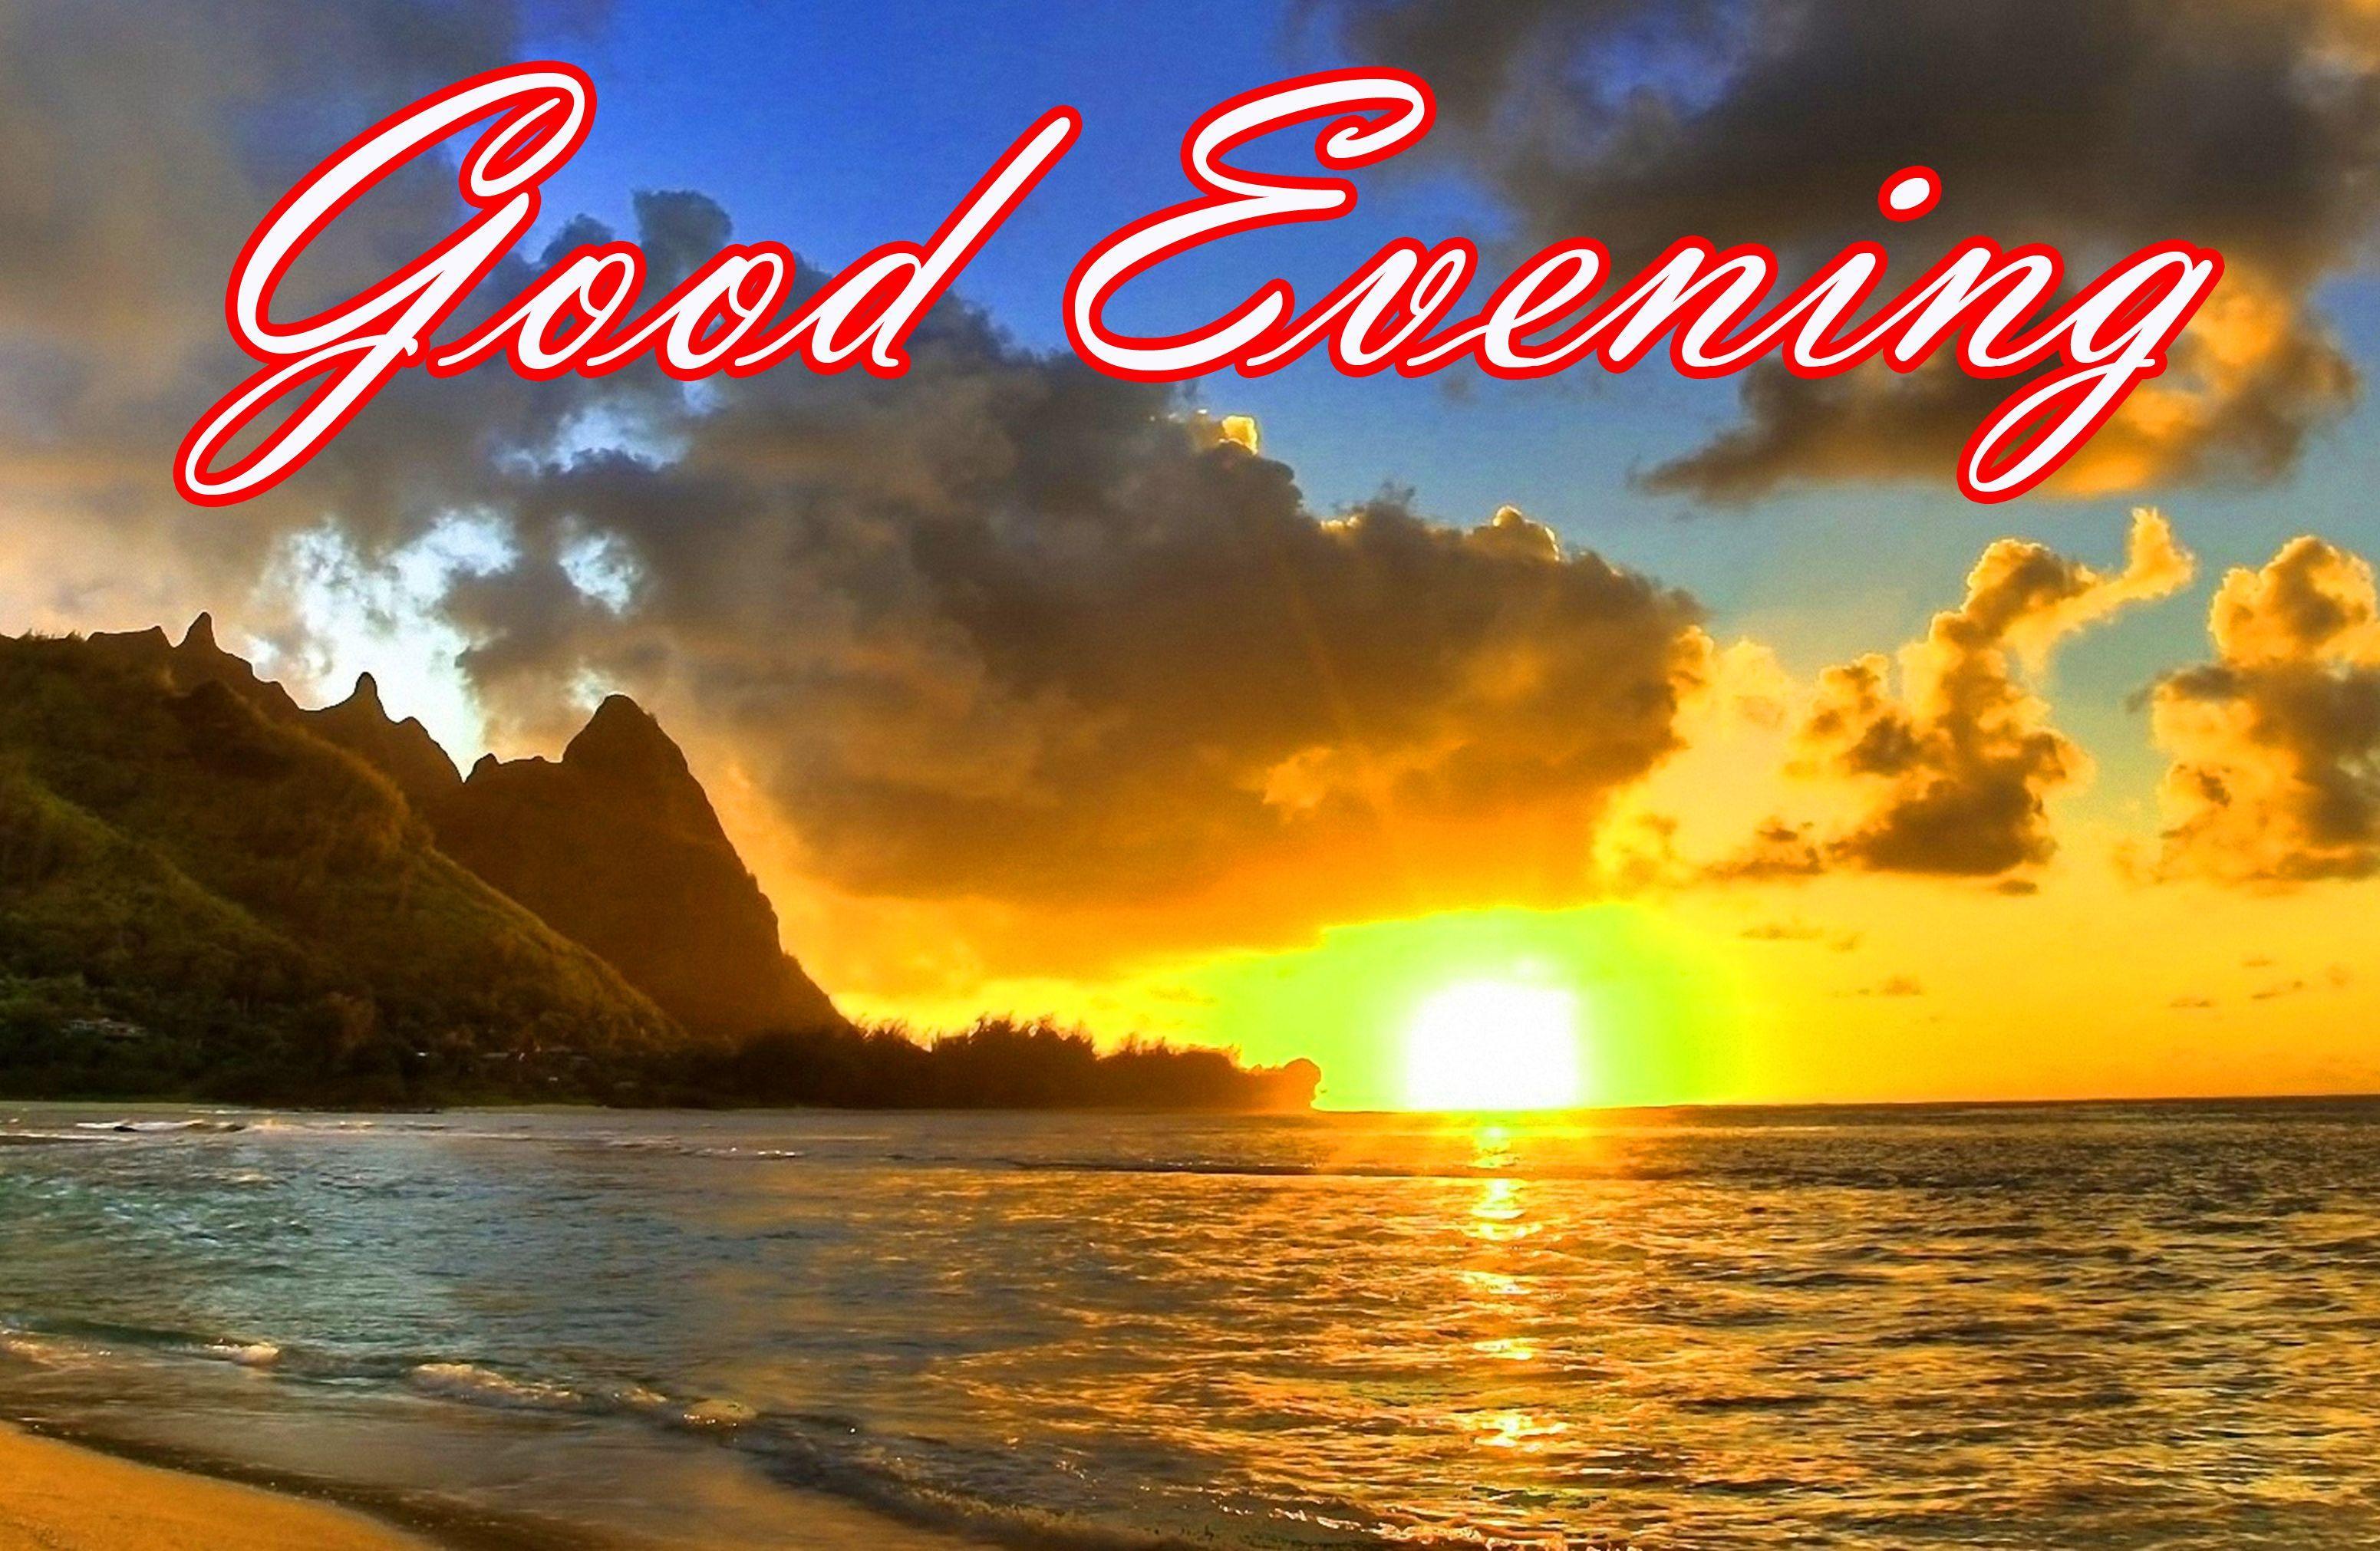 good evening wallpapers  top free good evening